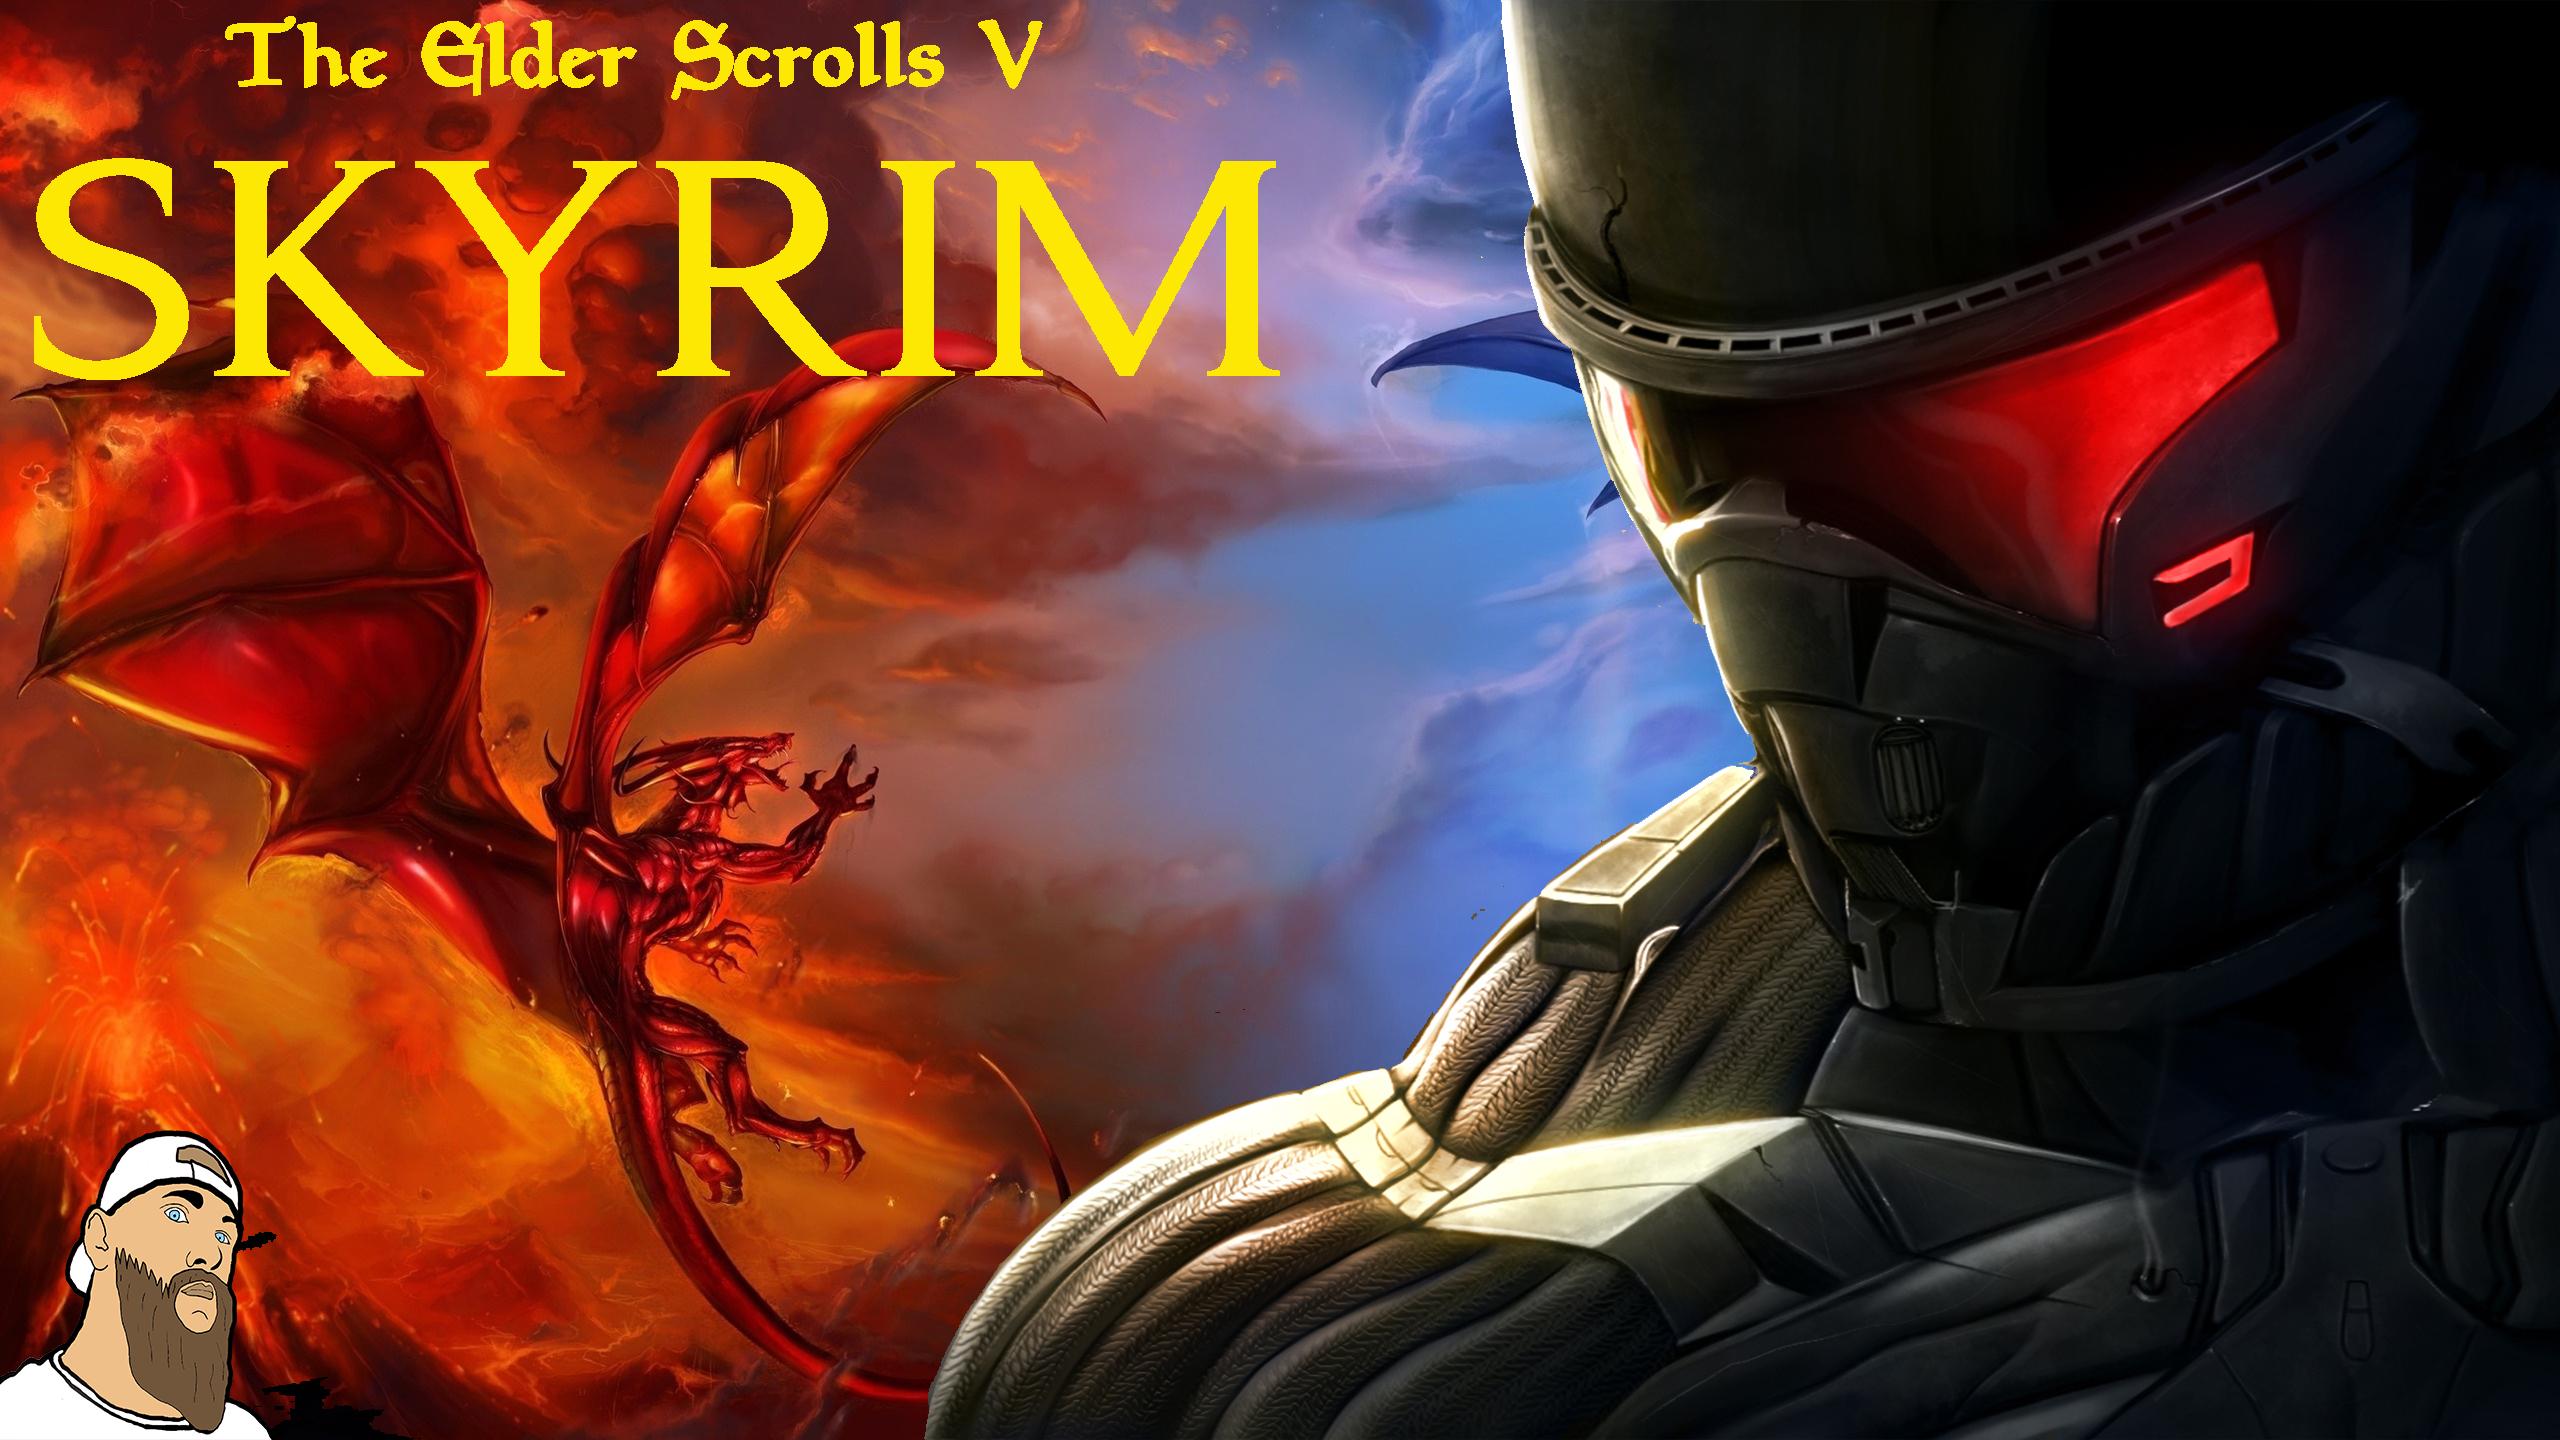 Skyrim VS Crysis - Elder Scrolls 5: Skyrim, the 1440, 2560, 2k, cryengine, full hd, VS, обои